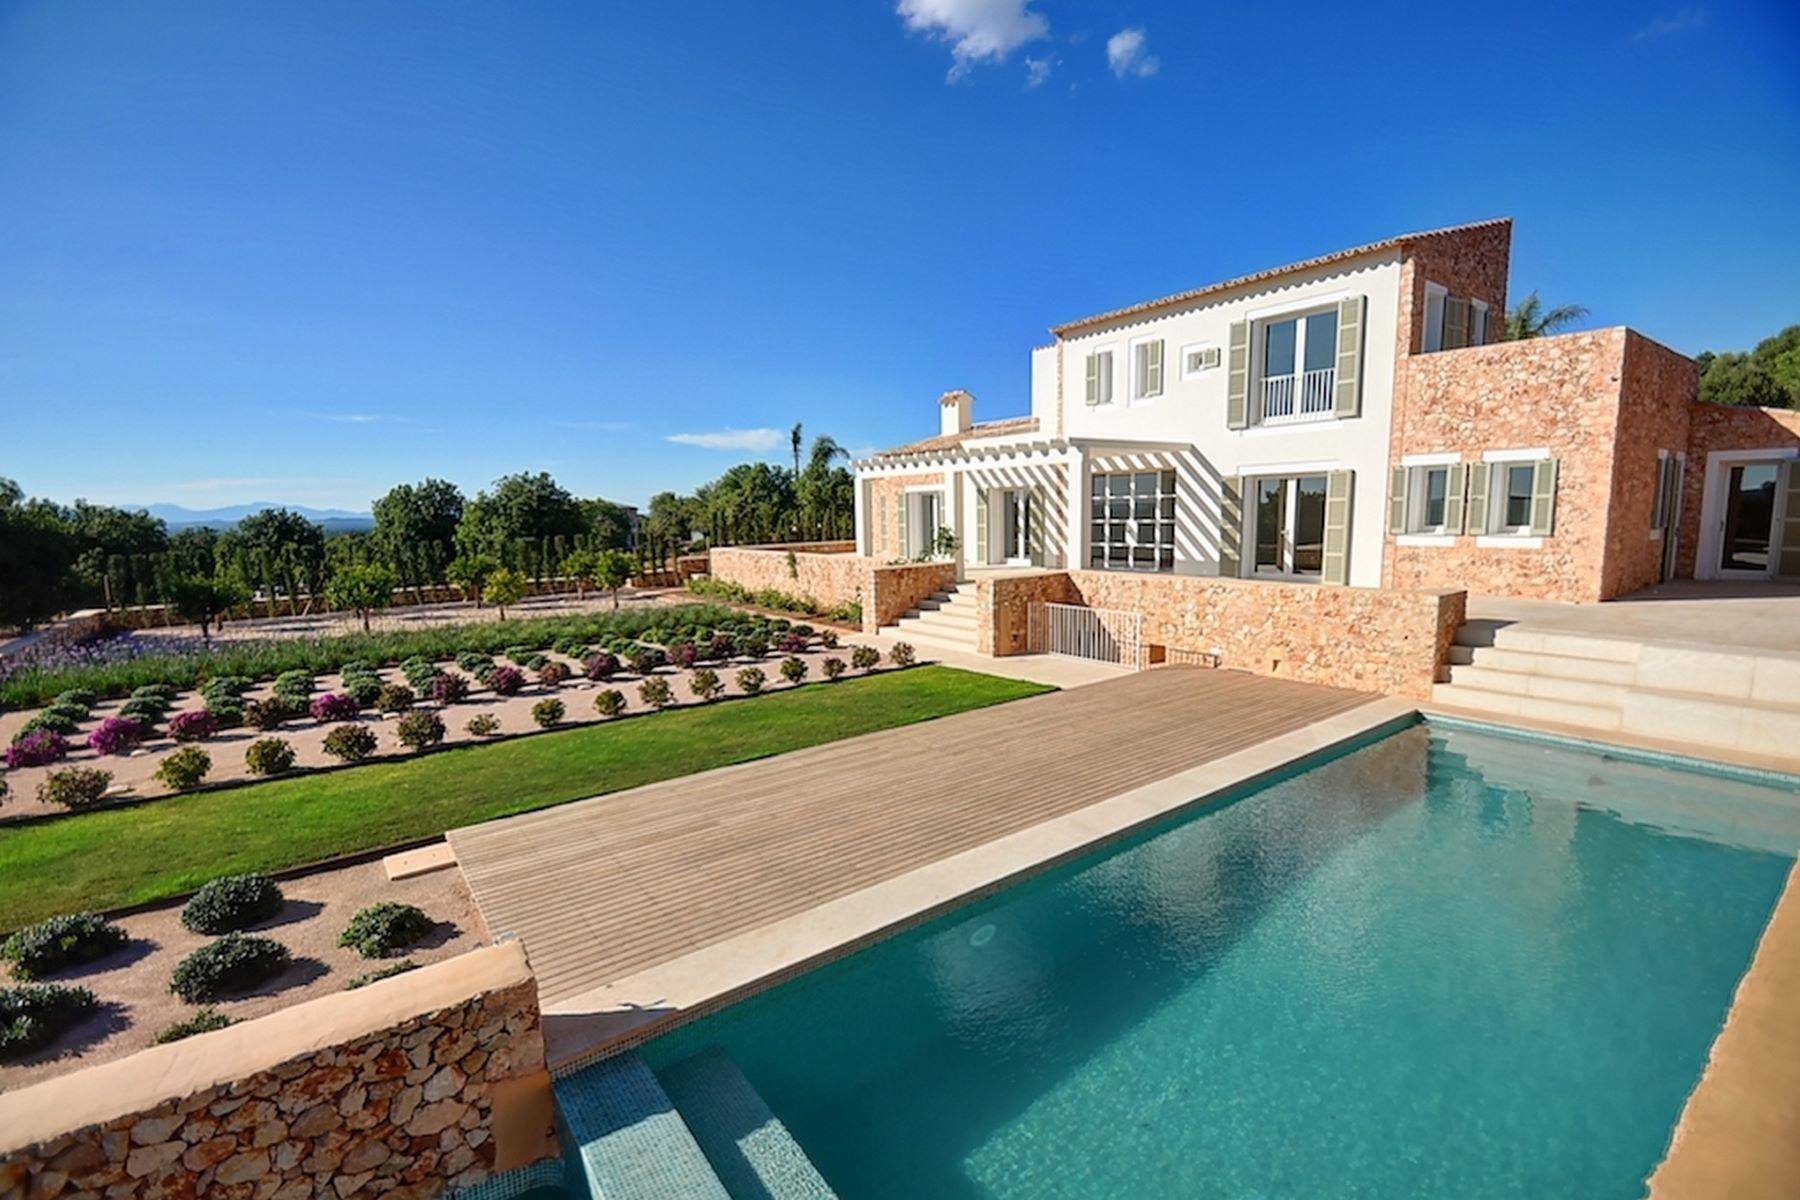 Single Family Homes for Sale at Wonderful finca in Cas Concos oficina christine Palma De Mallorca, Balearic Islands 00000 Spain